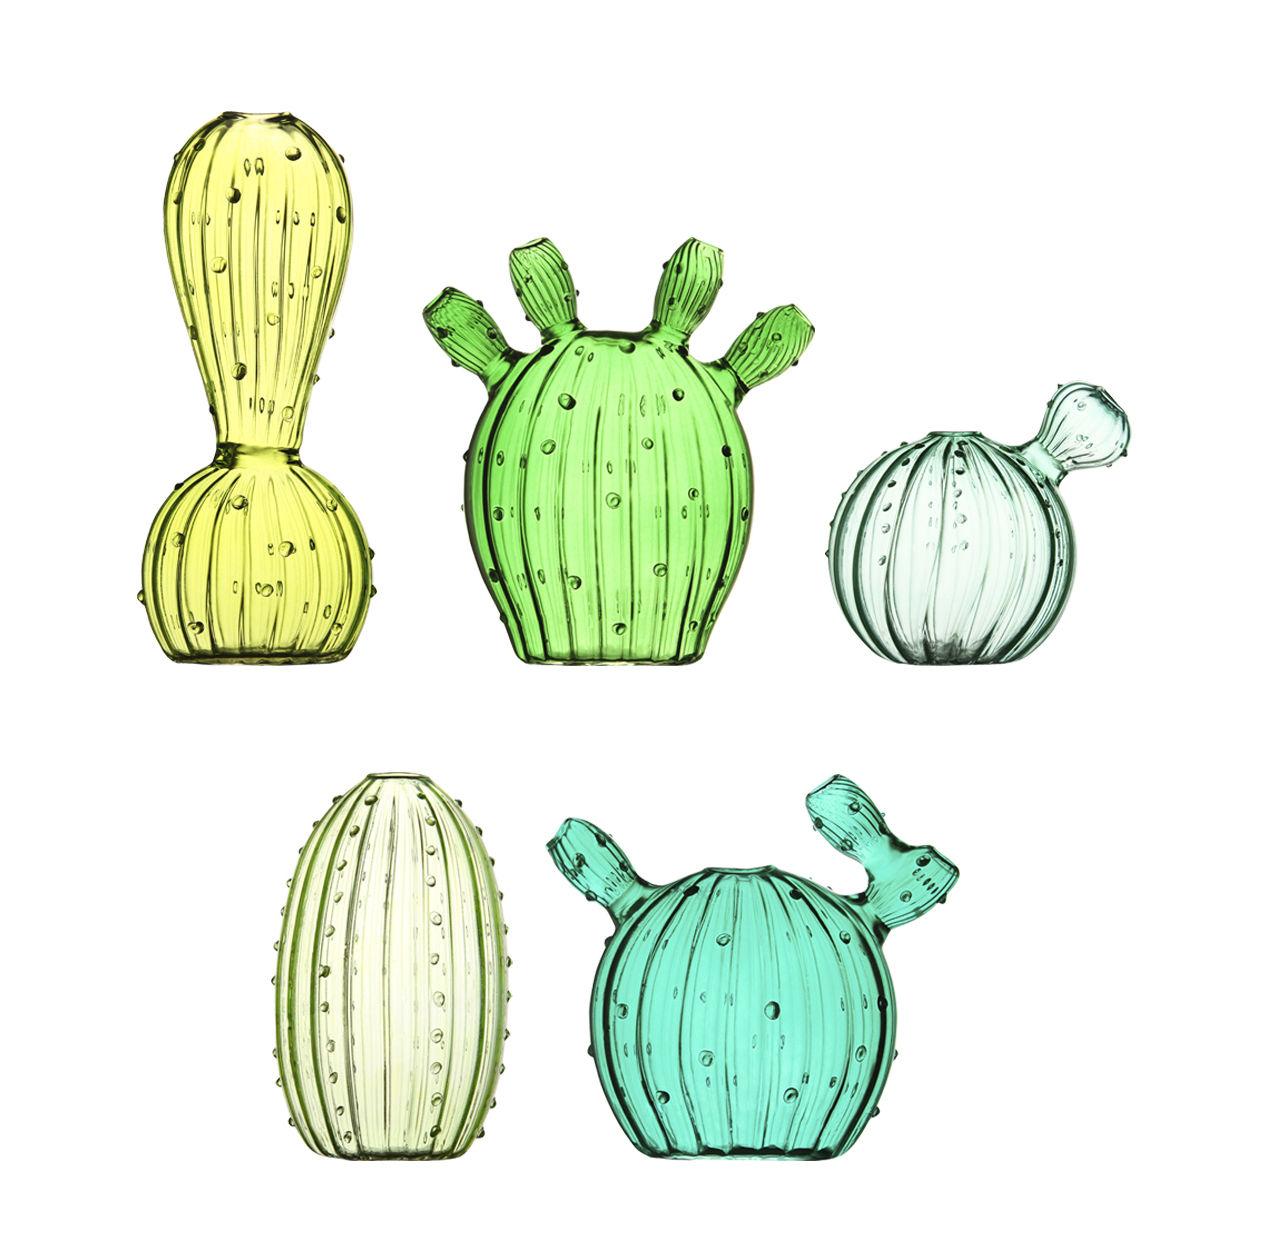 Decoration - Vases - Cactus Vase - / Set of 5 by & klevering - Green - Tinted glass